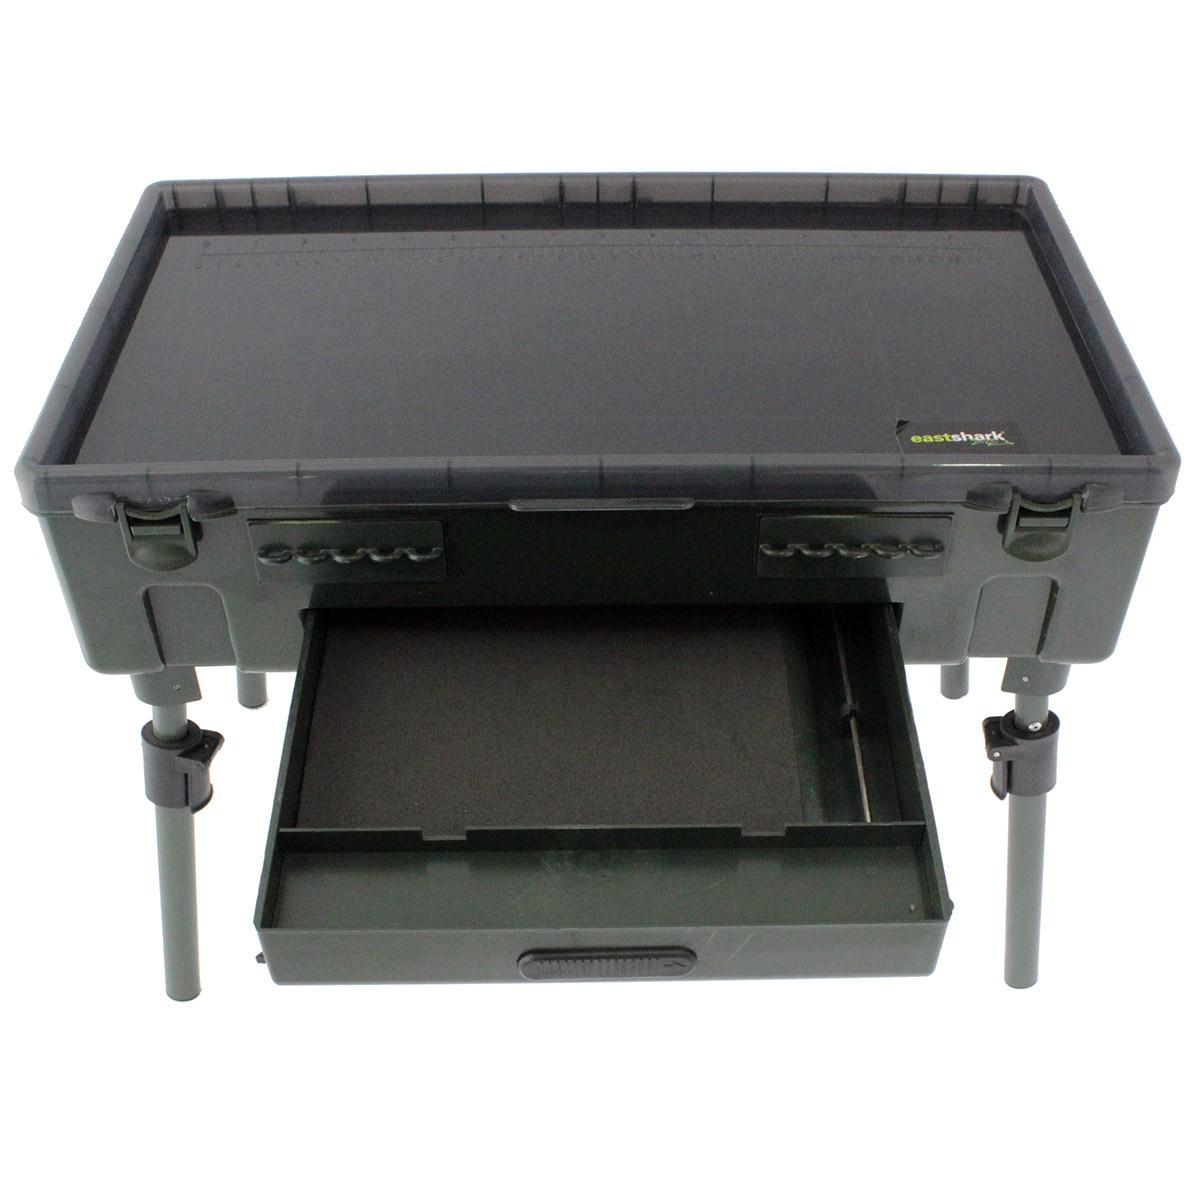 Кутия-органайзер масичка Eastshark 4